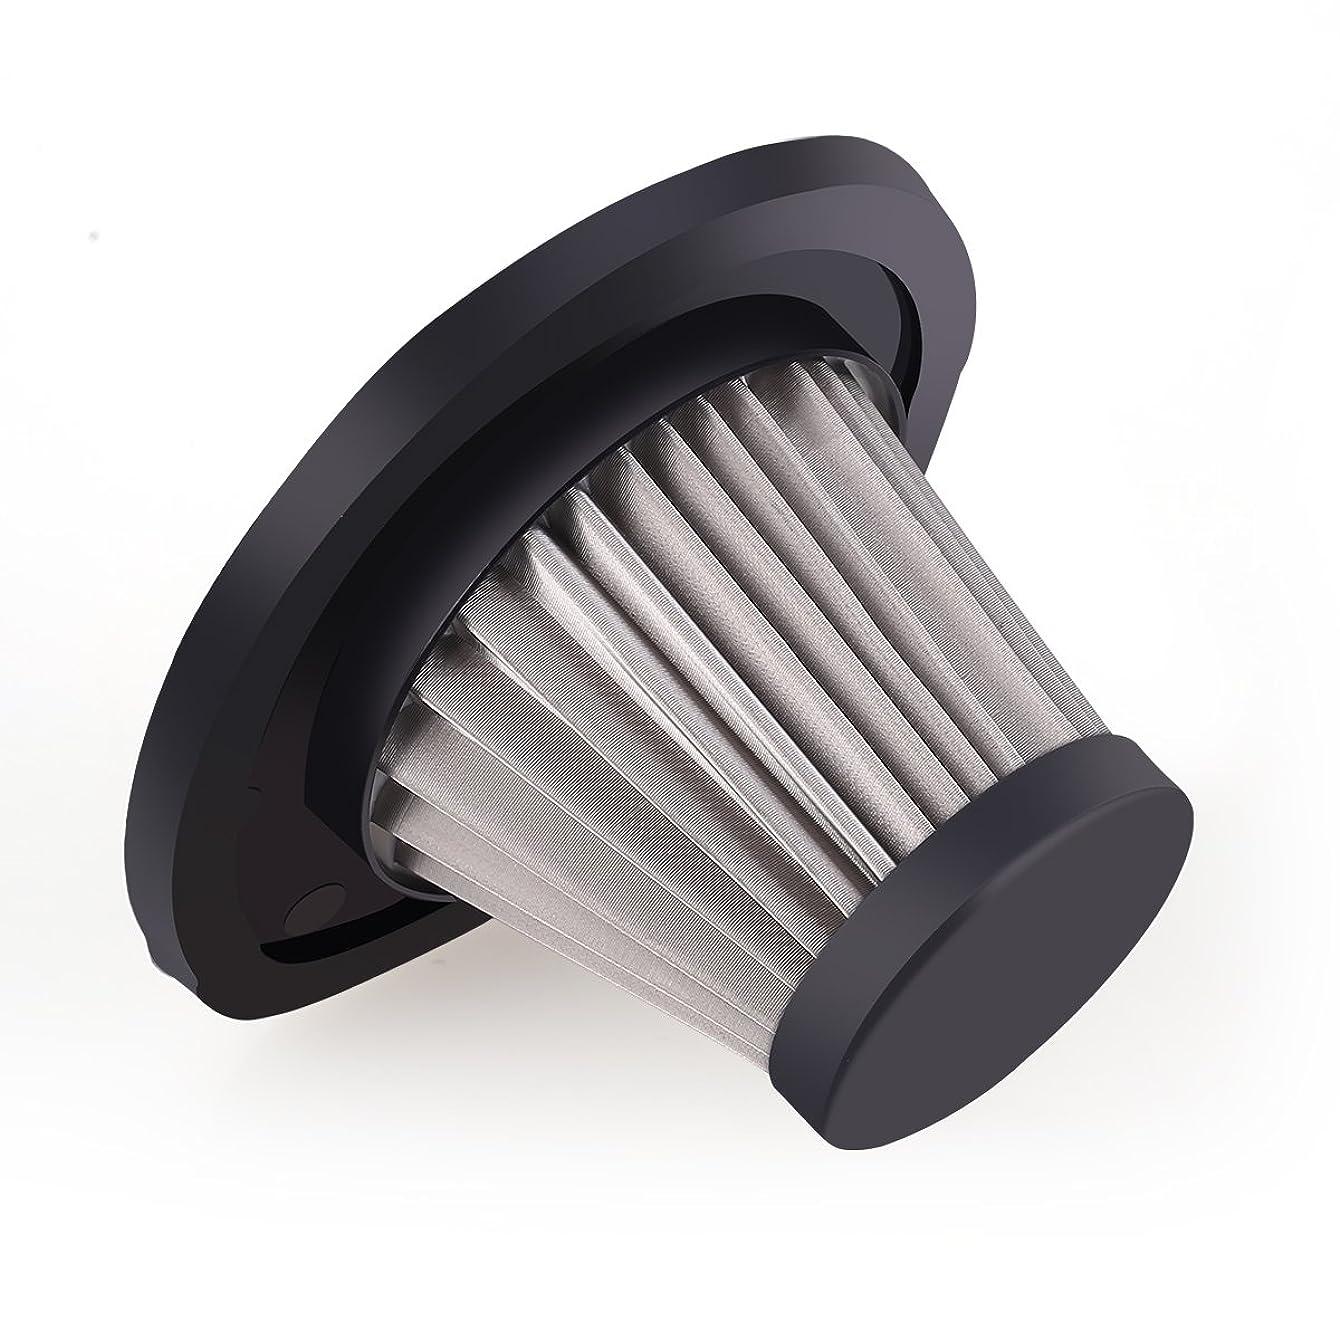 Vacplus Car Vacuum Filter, Stainless Steel HEPA Filter, Compatible Car Vacuum